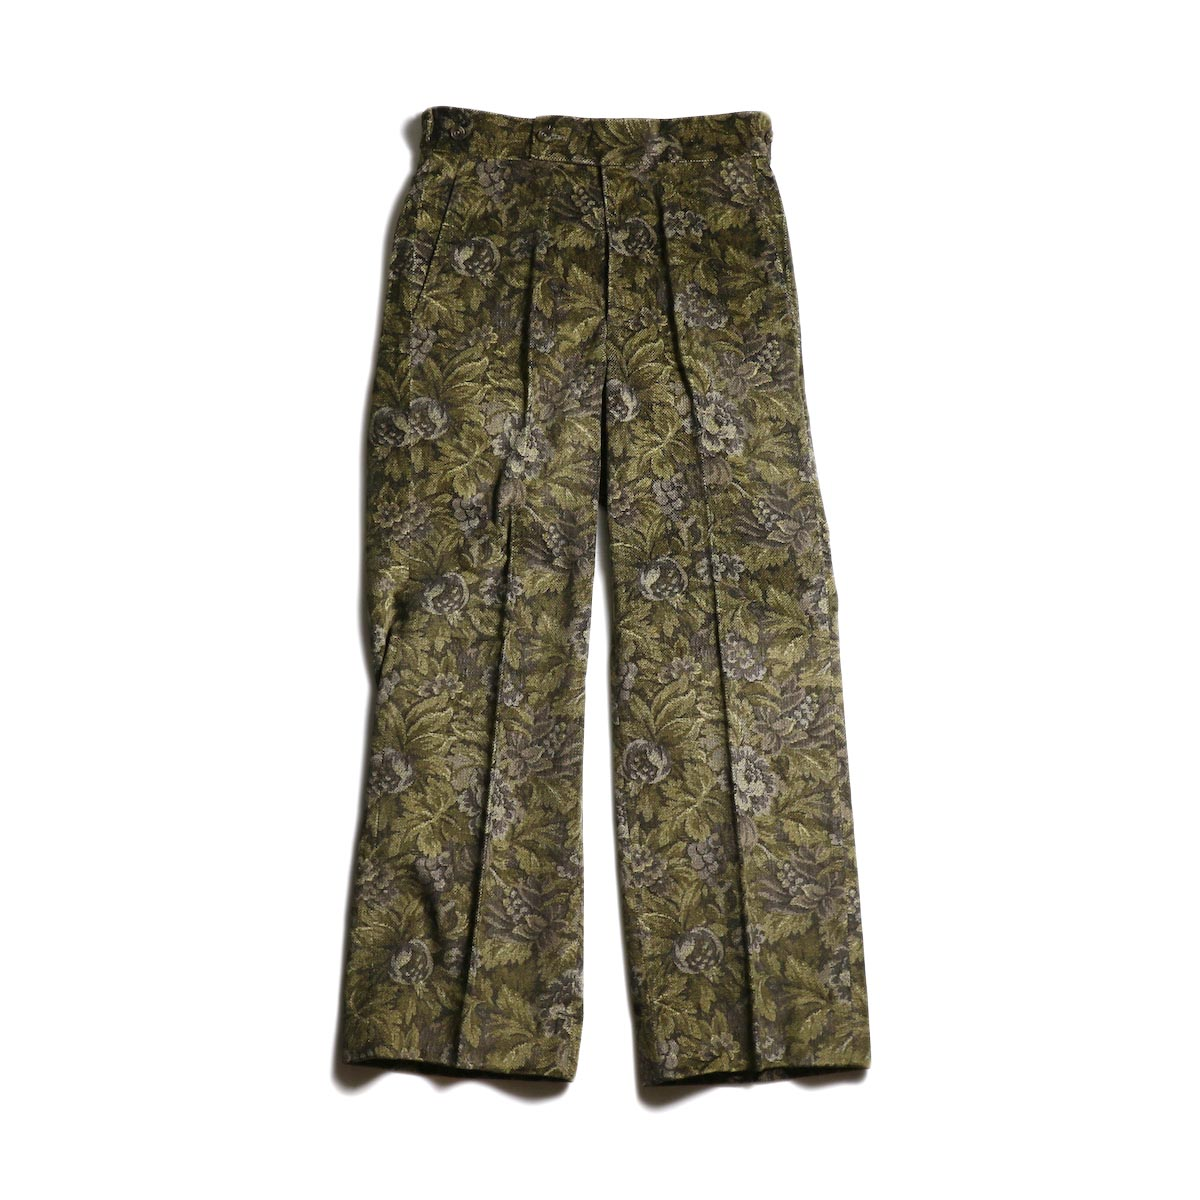 Needles / Side Tab Trouser -Dobby Corduroy (Brown)